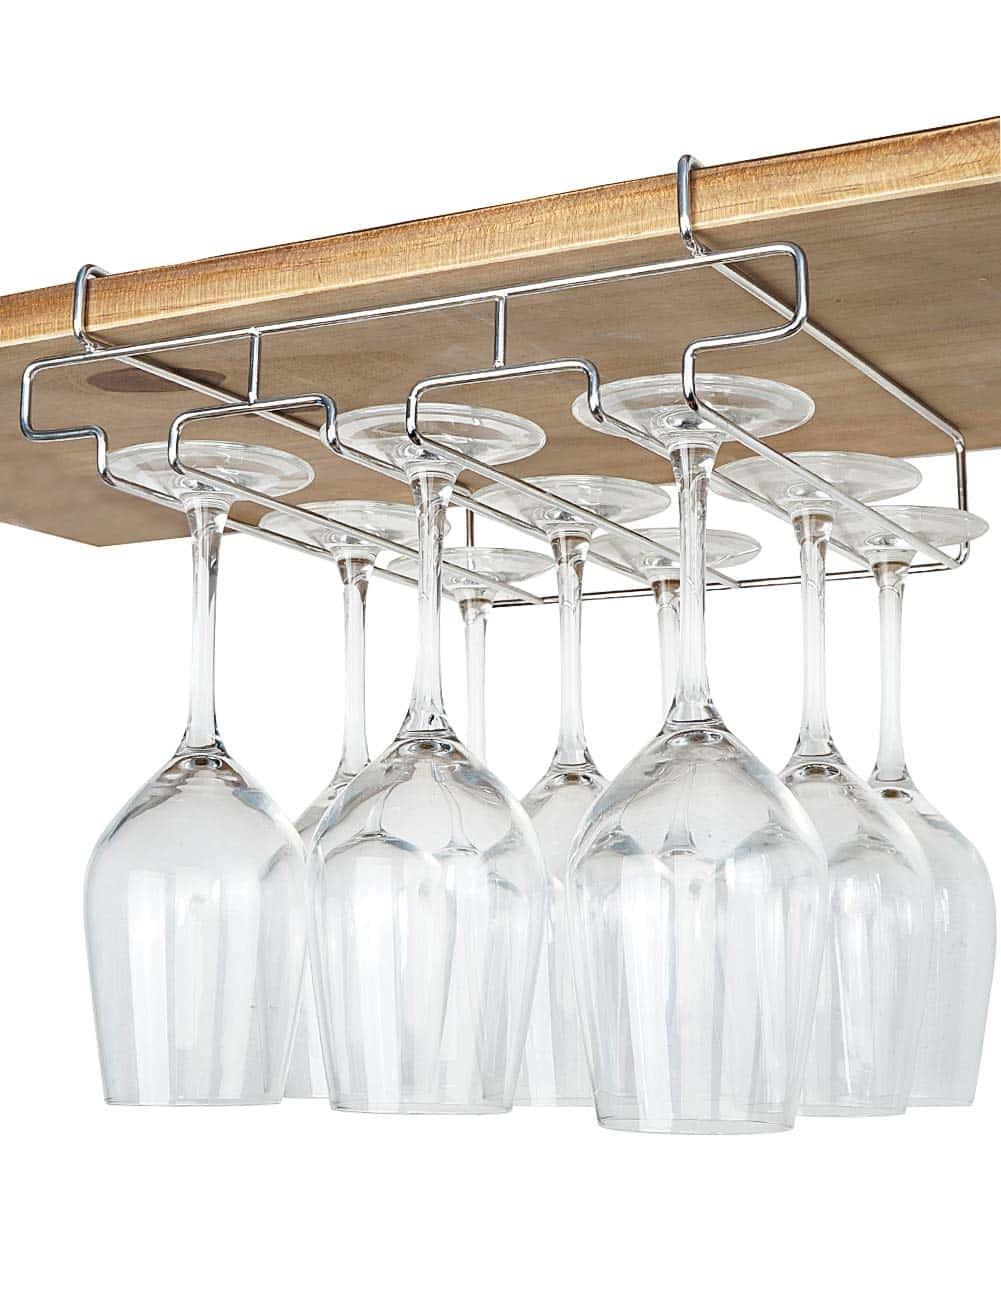 Bronze Foxom Stemware Rack Wine Glass Rack Hanger Holder With Screws Pack of 2 Row for Bar Home Cafe